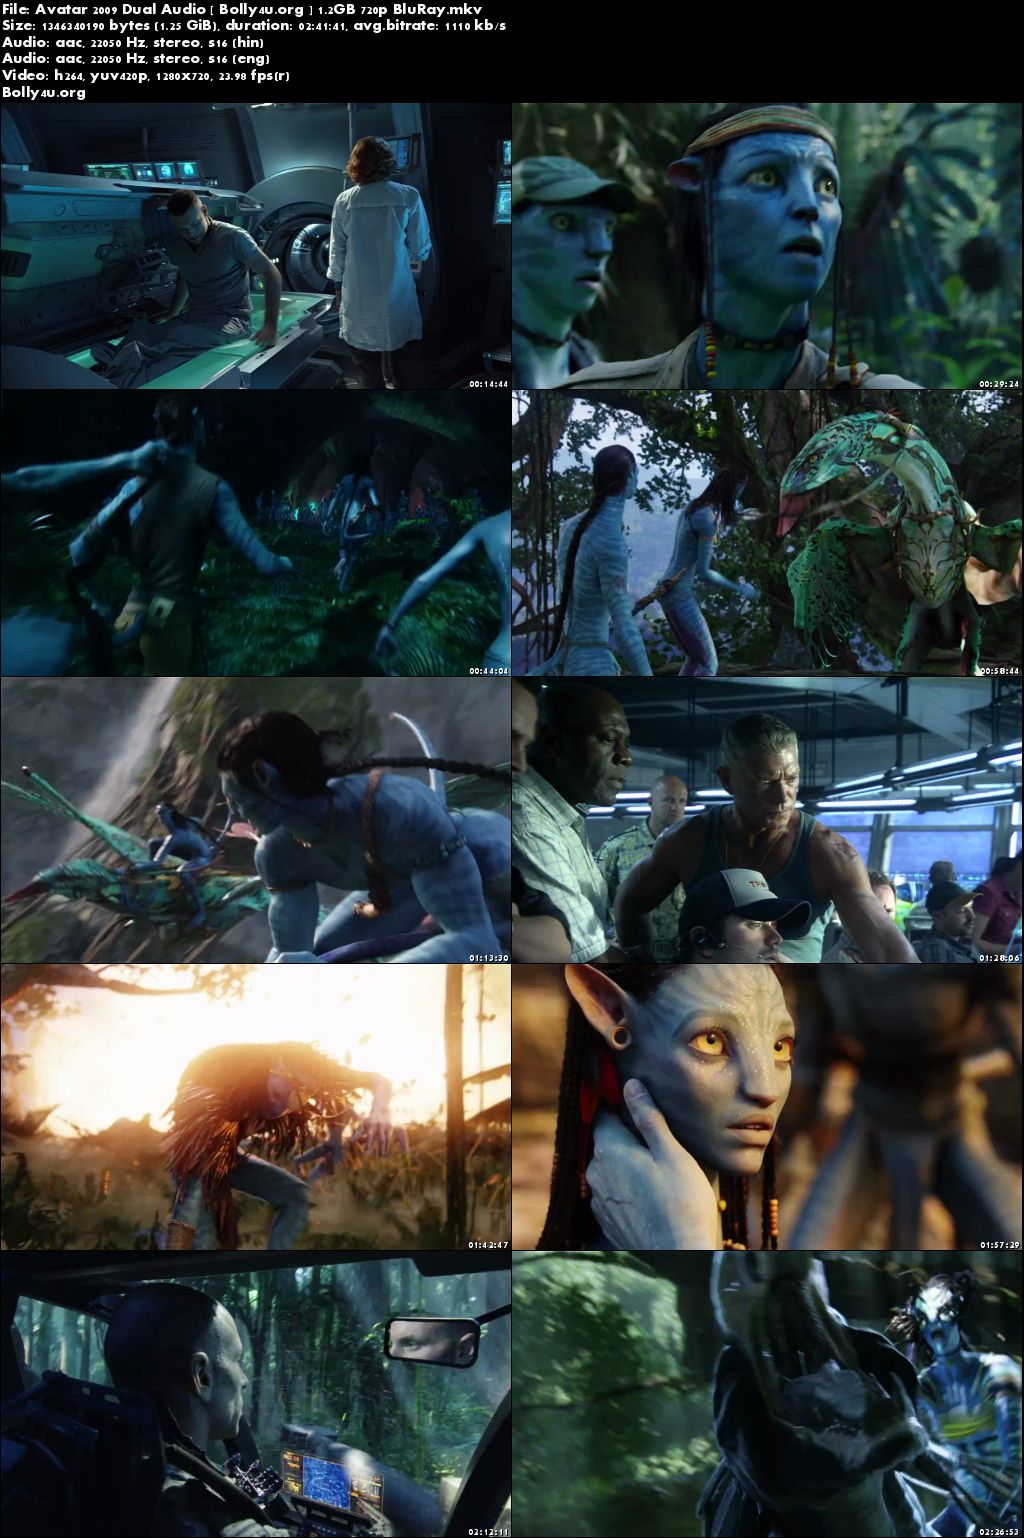 Avatar 2009 BluRay 500MB Hindi English Dual Audio 480p Download